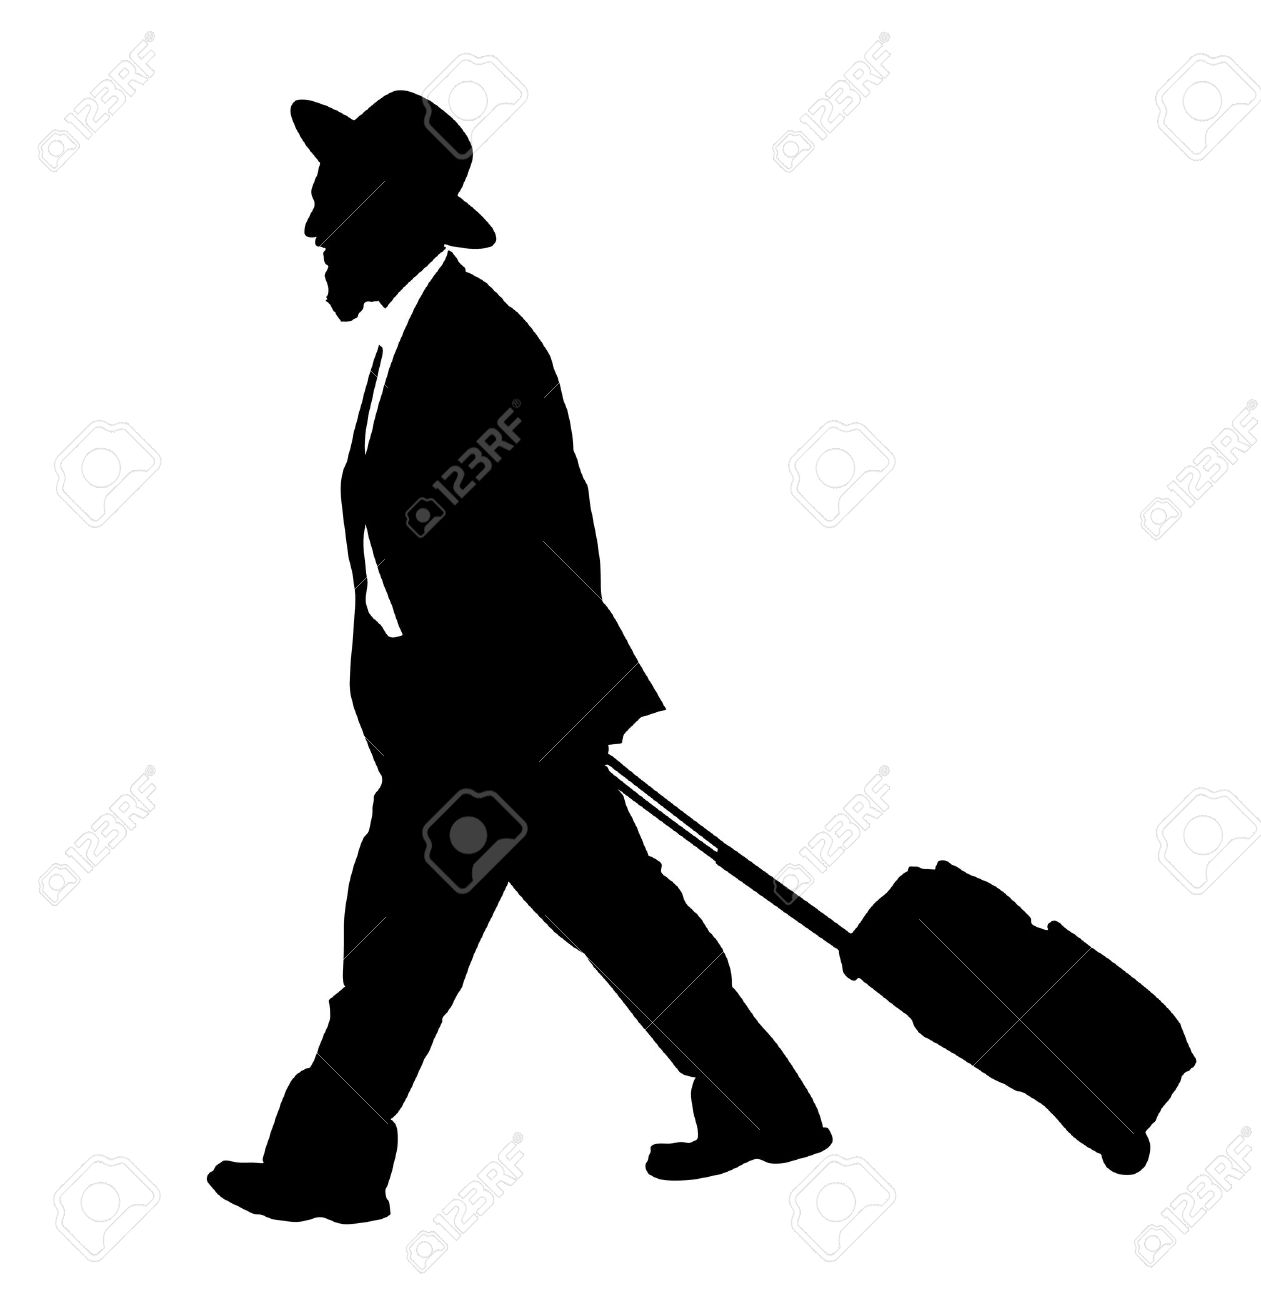 Amish man is suite silhouette illustration. Jewish business man. Tourist man traveler carrying his rolling suitcase silhouette illustration isolated on white background. diamond merchant - 65989317